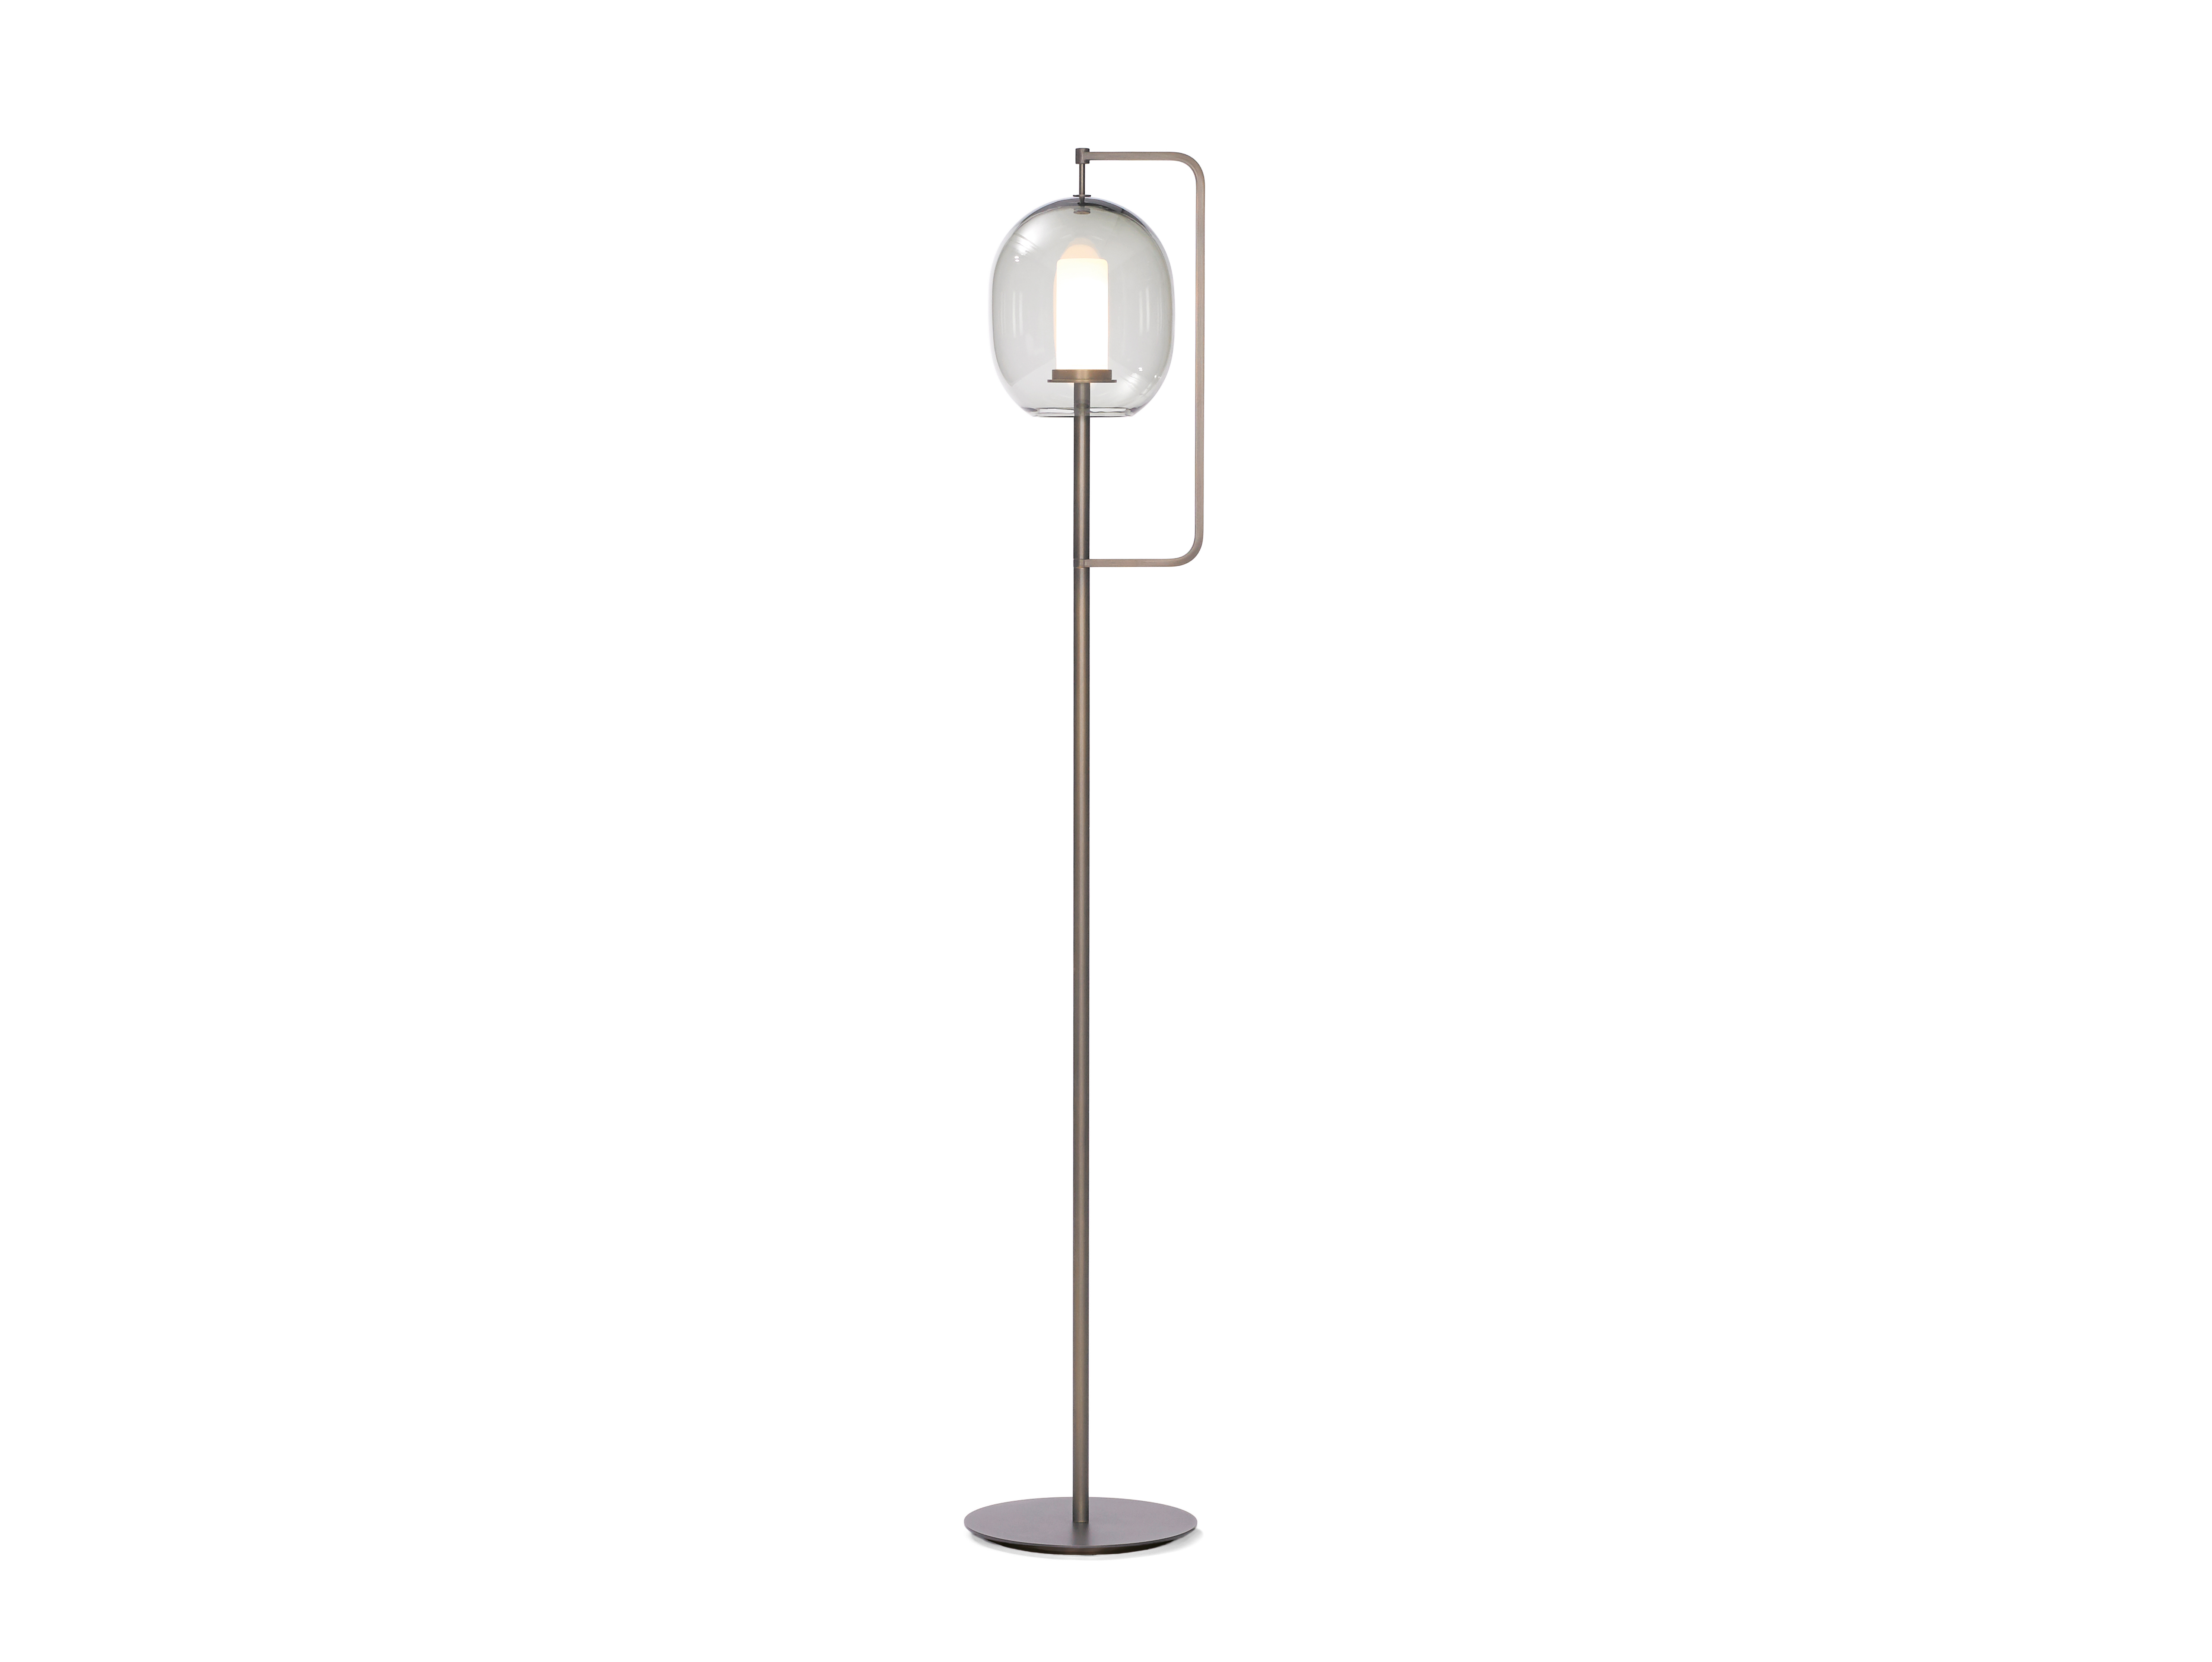 Lantern Light Floor Lamp By Classicon Stylepark